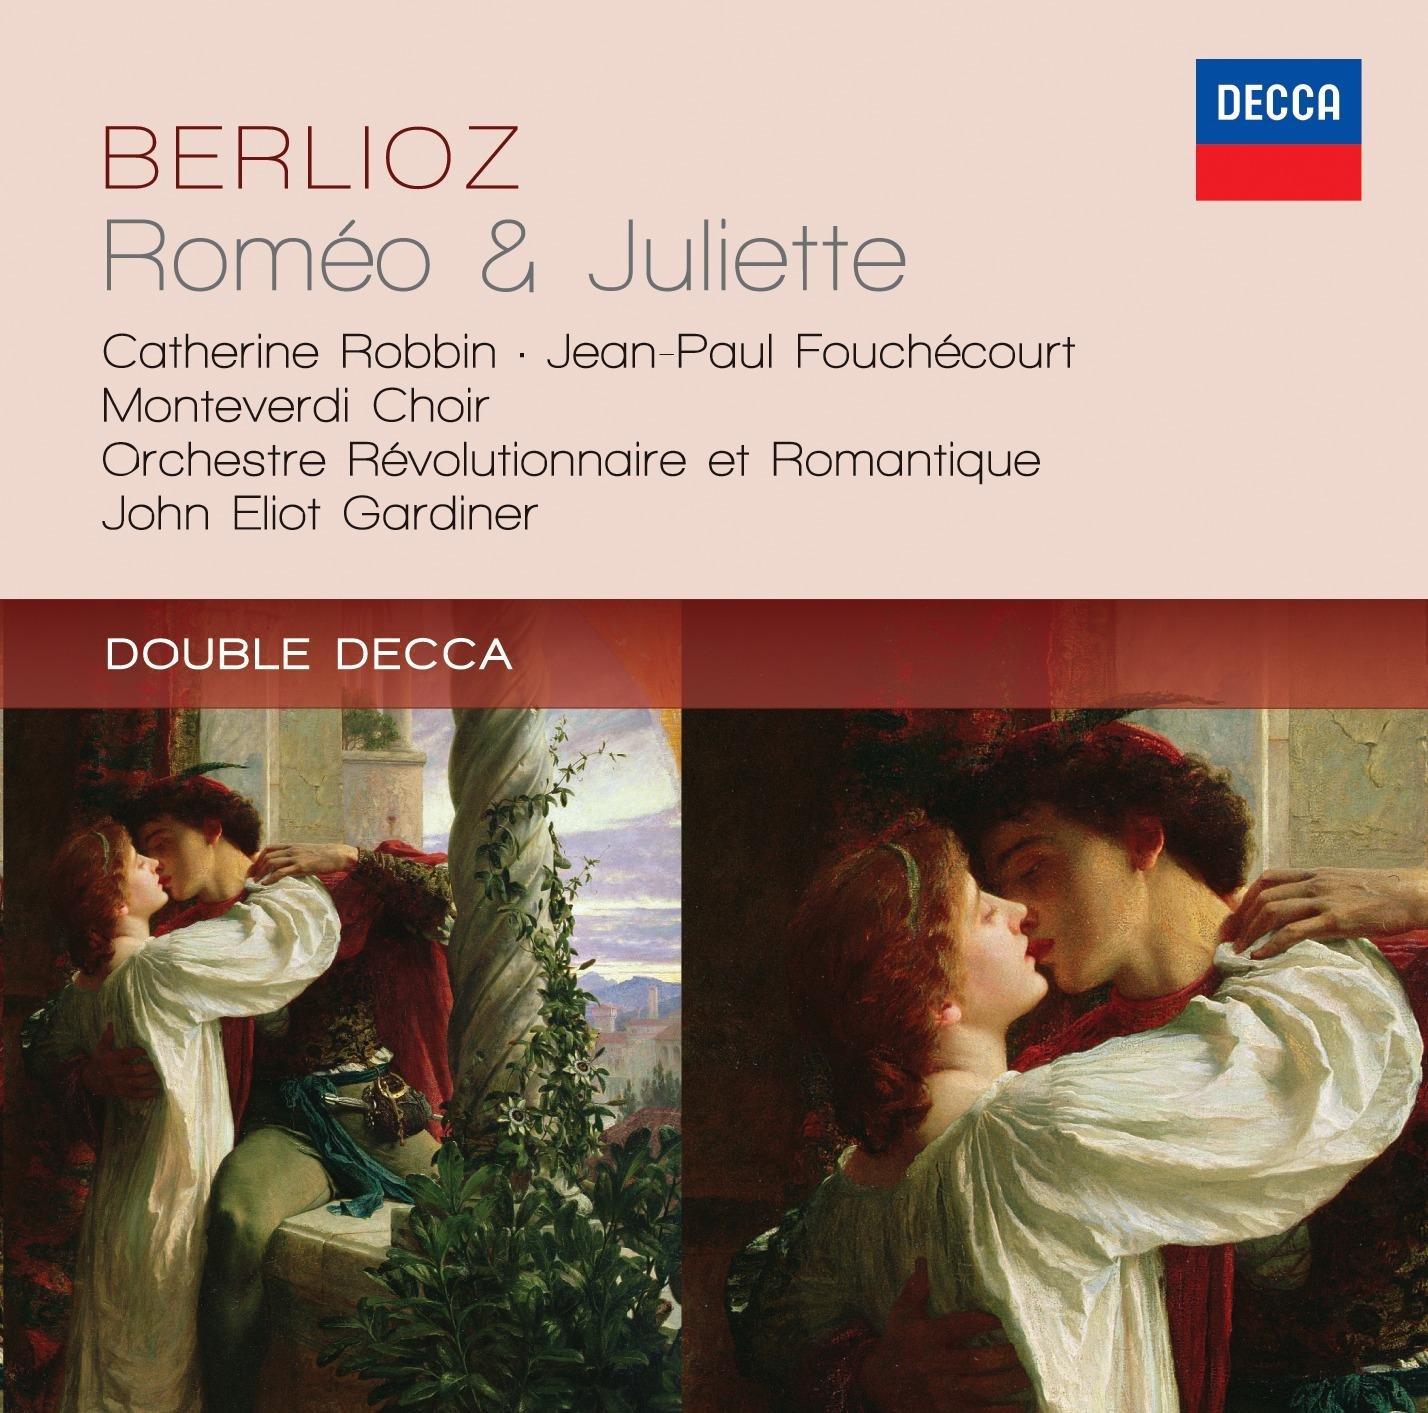 Hector Berlioz: symphonies + Lélio - Page 6 81LE9DdwBXL